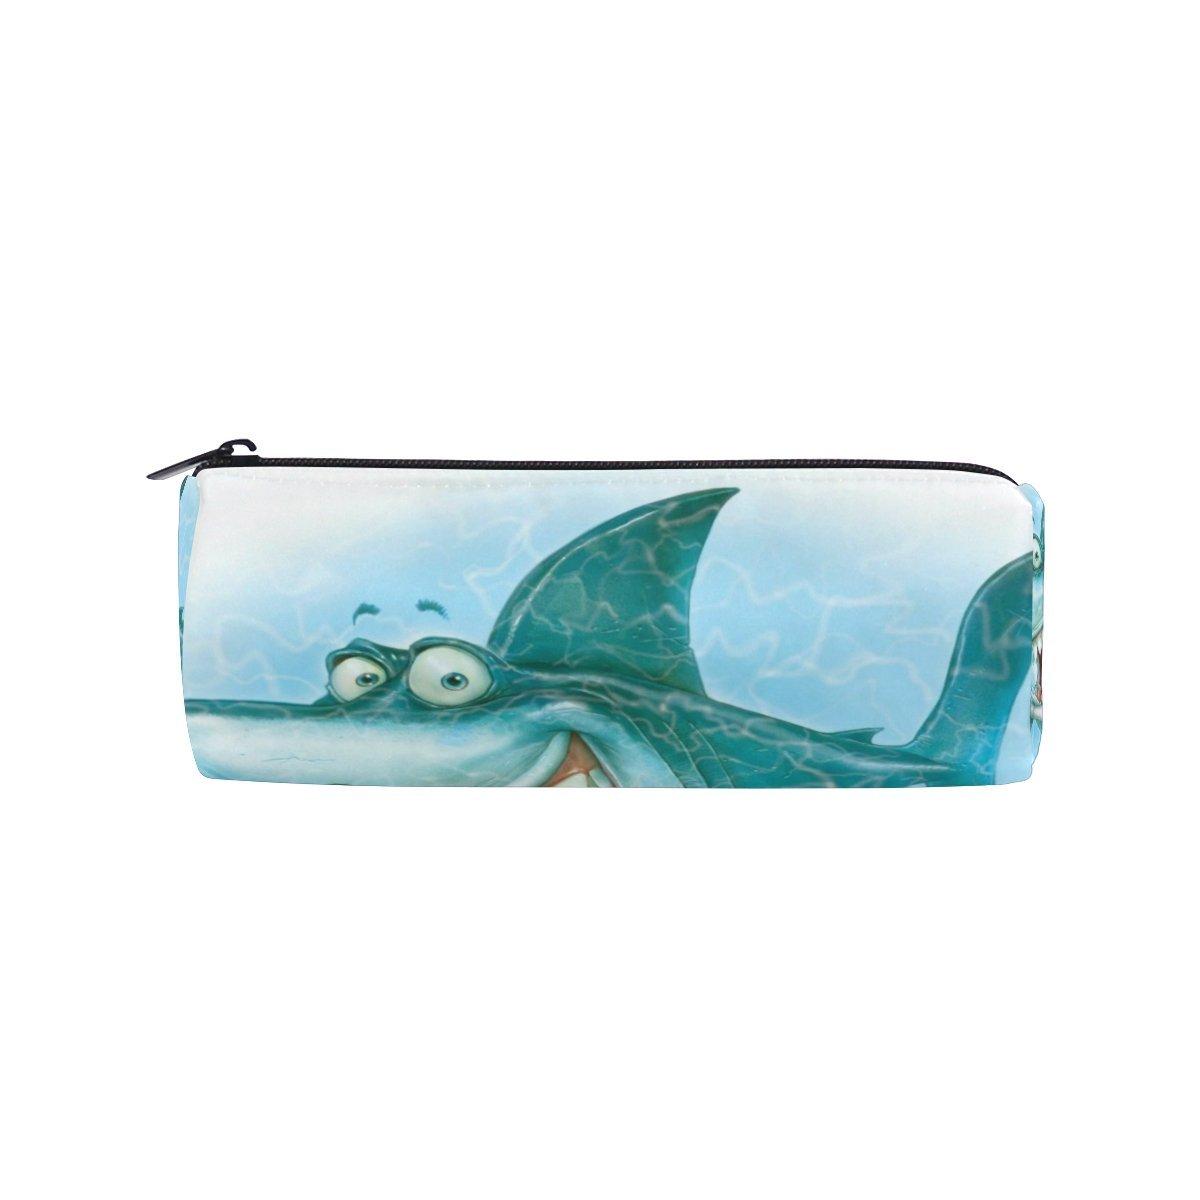 Pencil Pouch Animation Sharks Zipit Cute Pencil Cases School Pen Organizer Holder Womens Makeup Bag